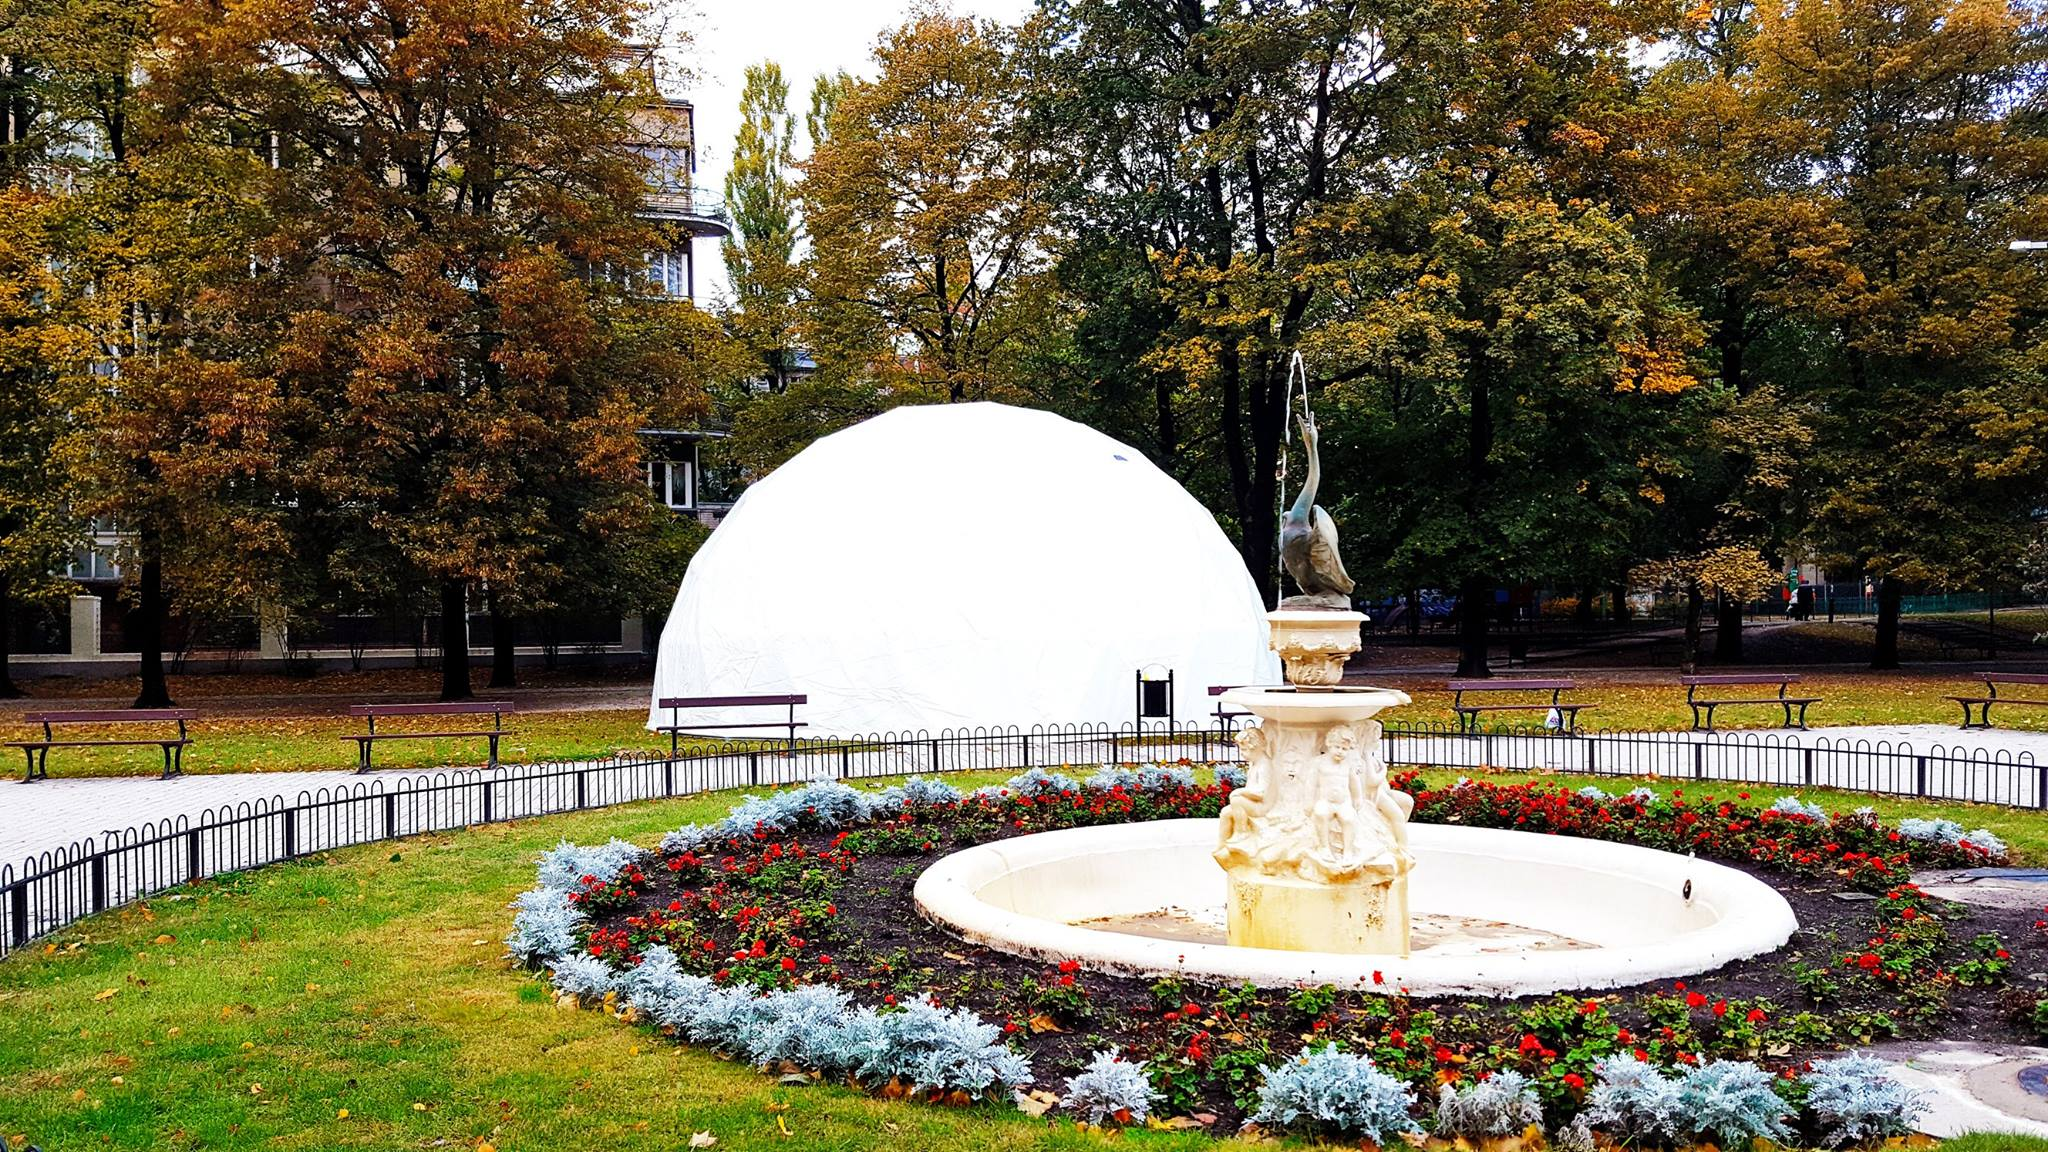 Ø11м Переносной купол для LIGHT MOVE FESTIVAL | Kinetic Art, Лодзь, Польша